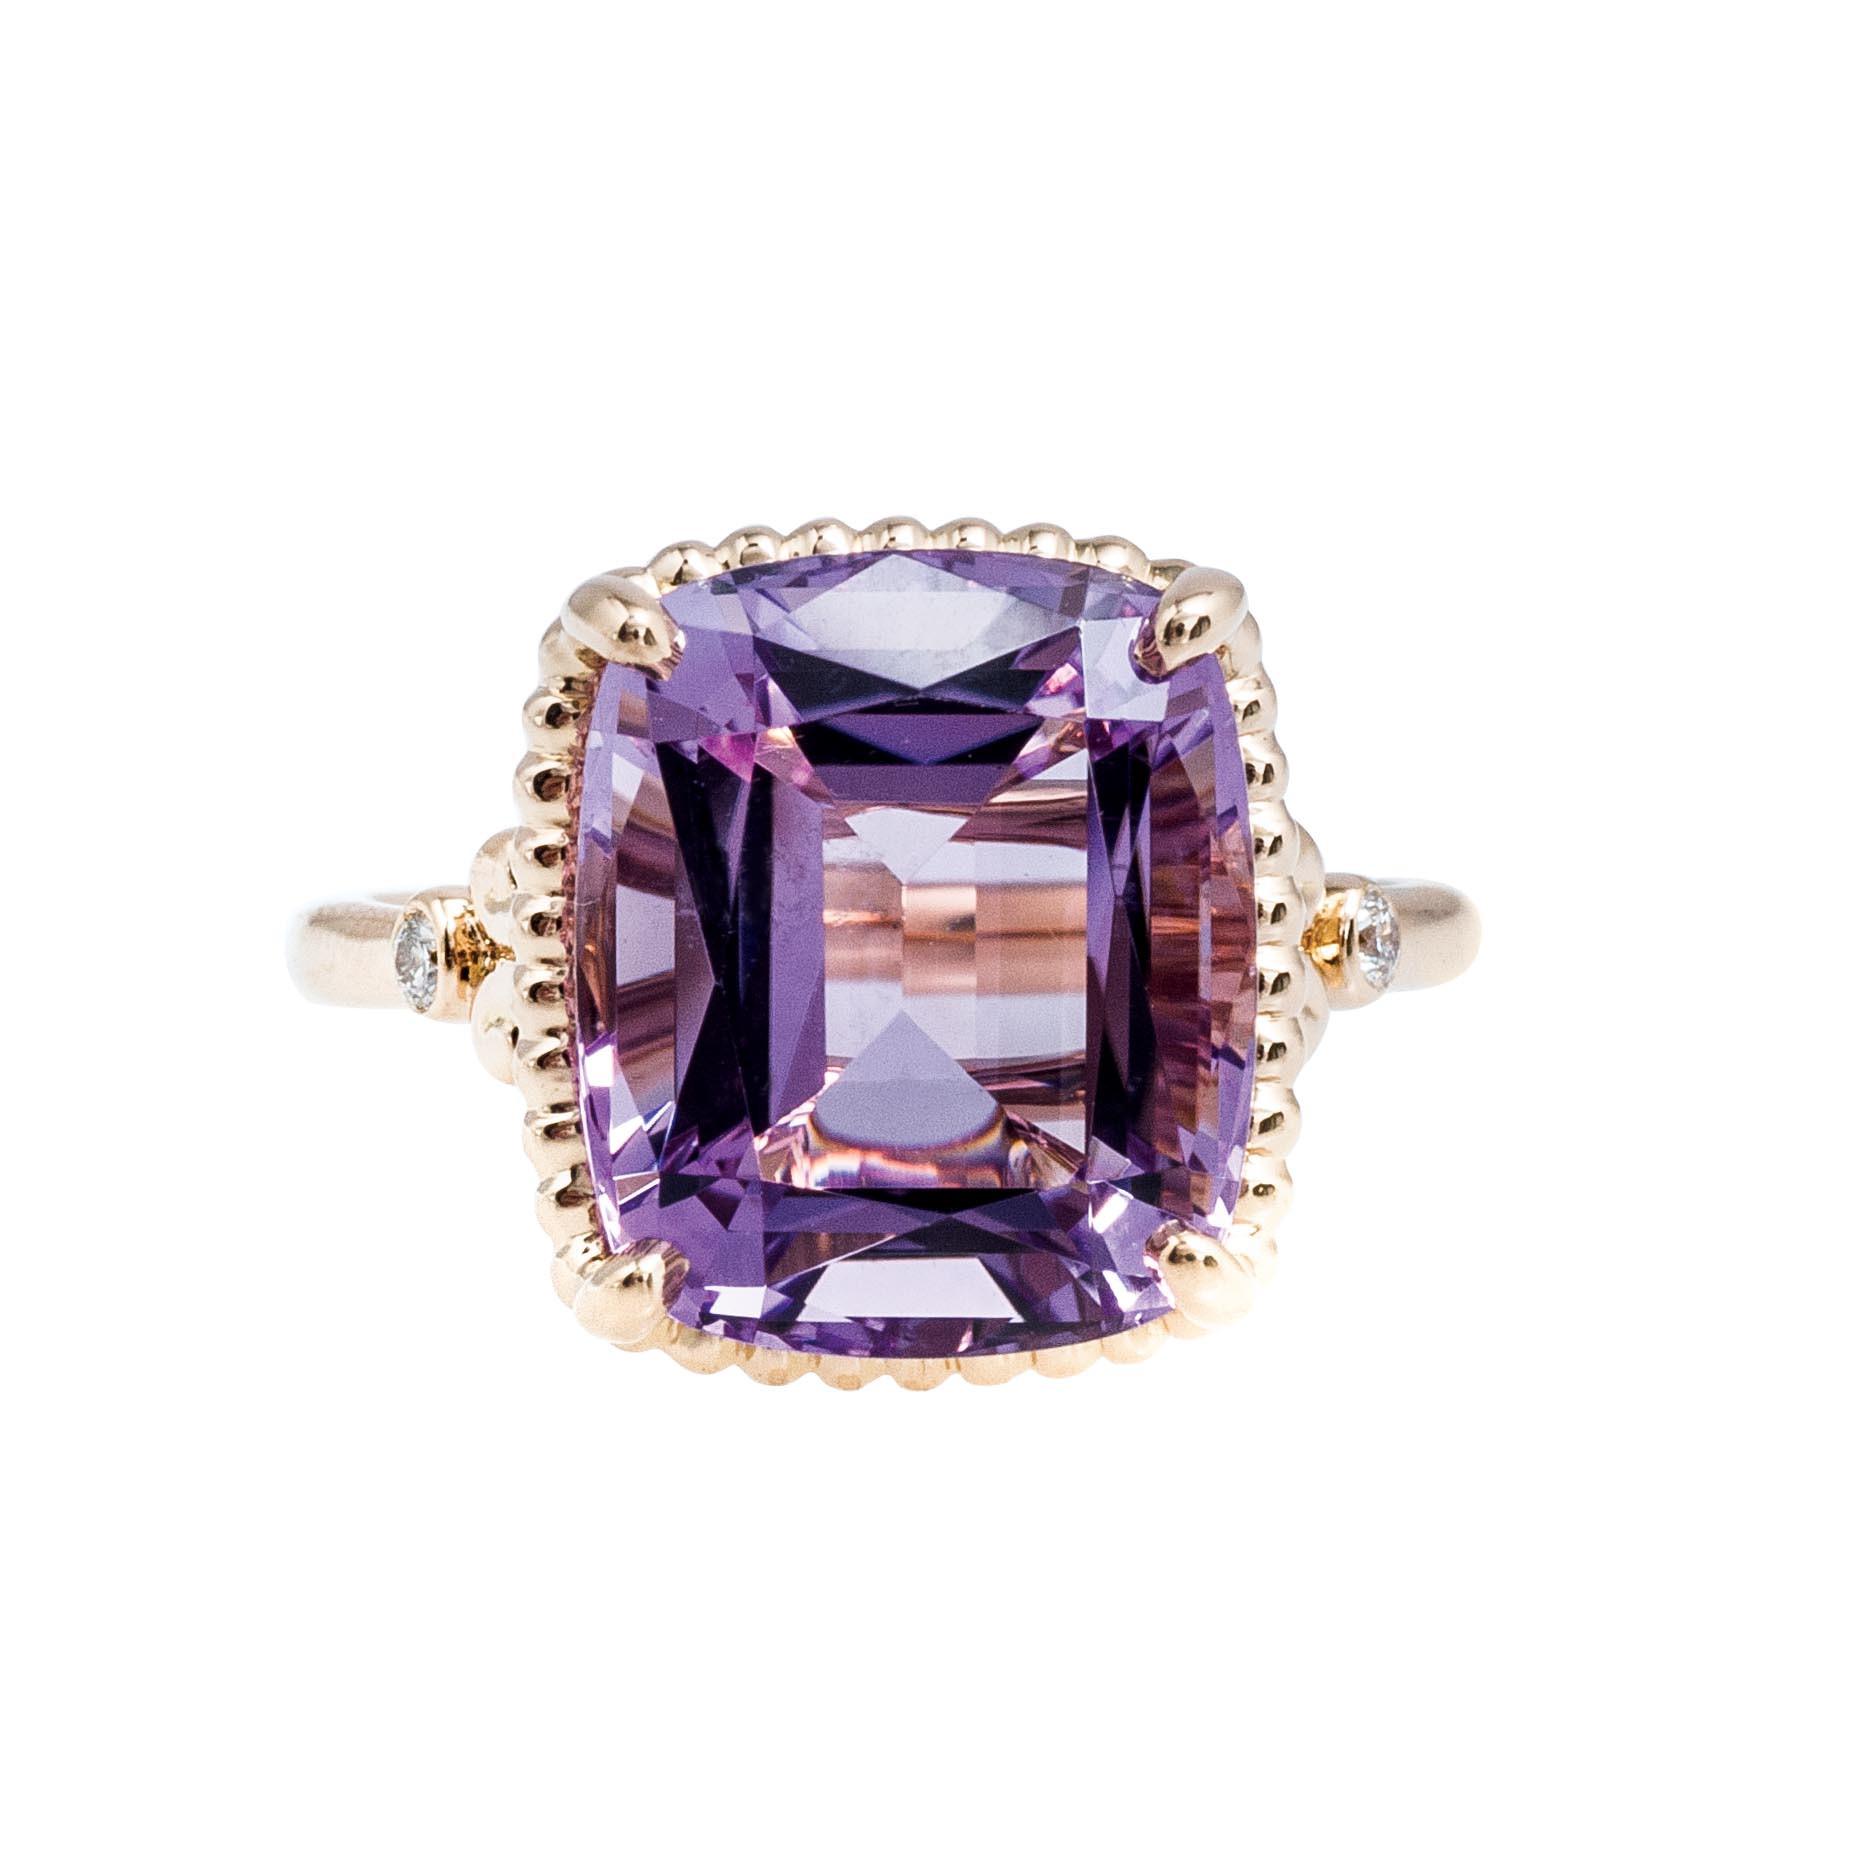 6428c10a9 5.73 ctw amethyst diamond tiffany sparklers ring ...